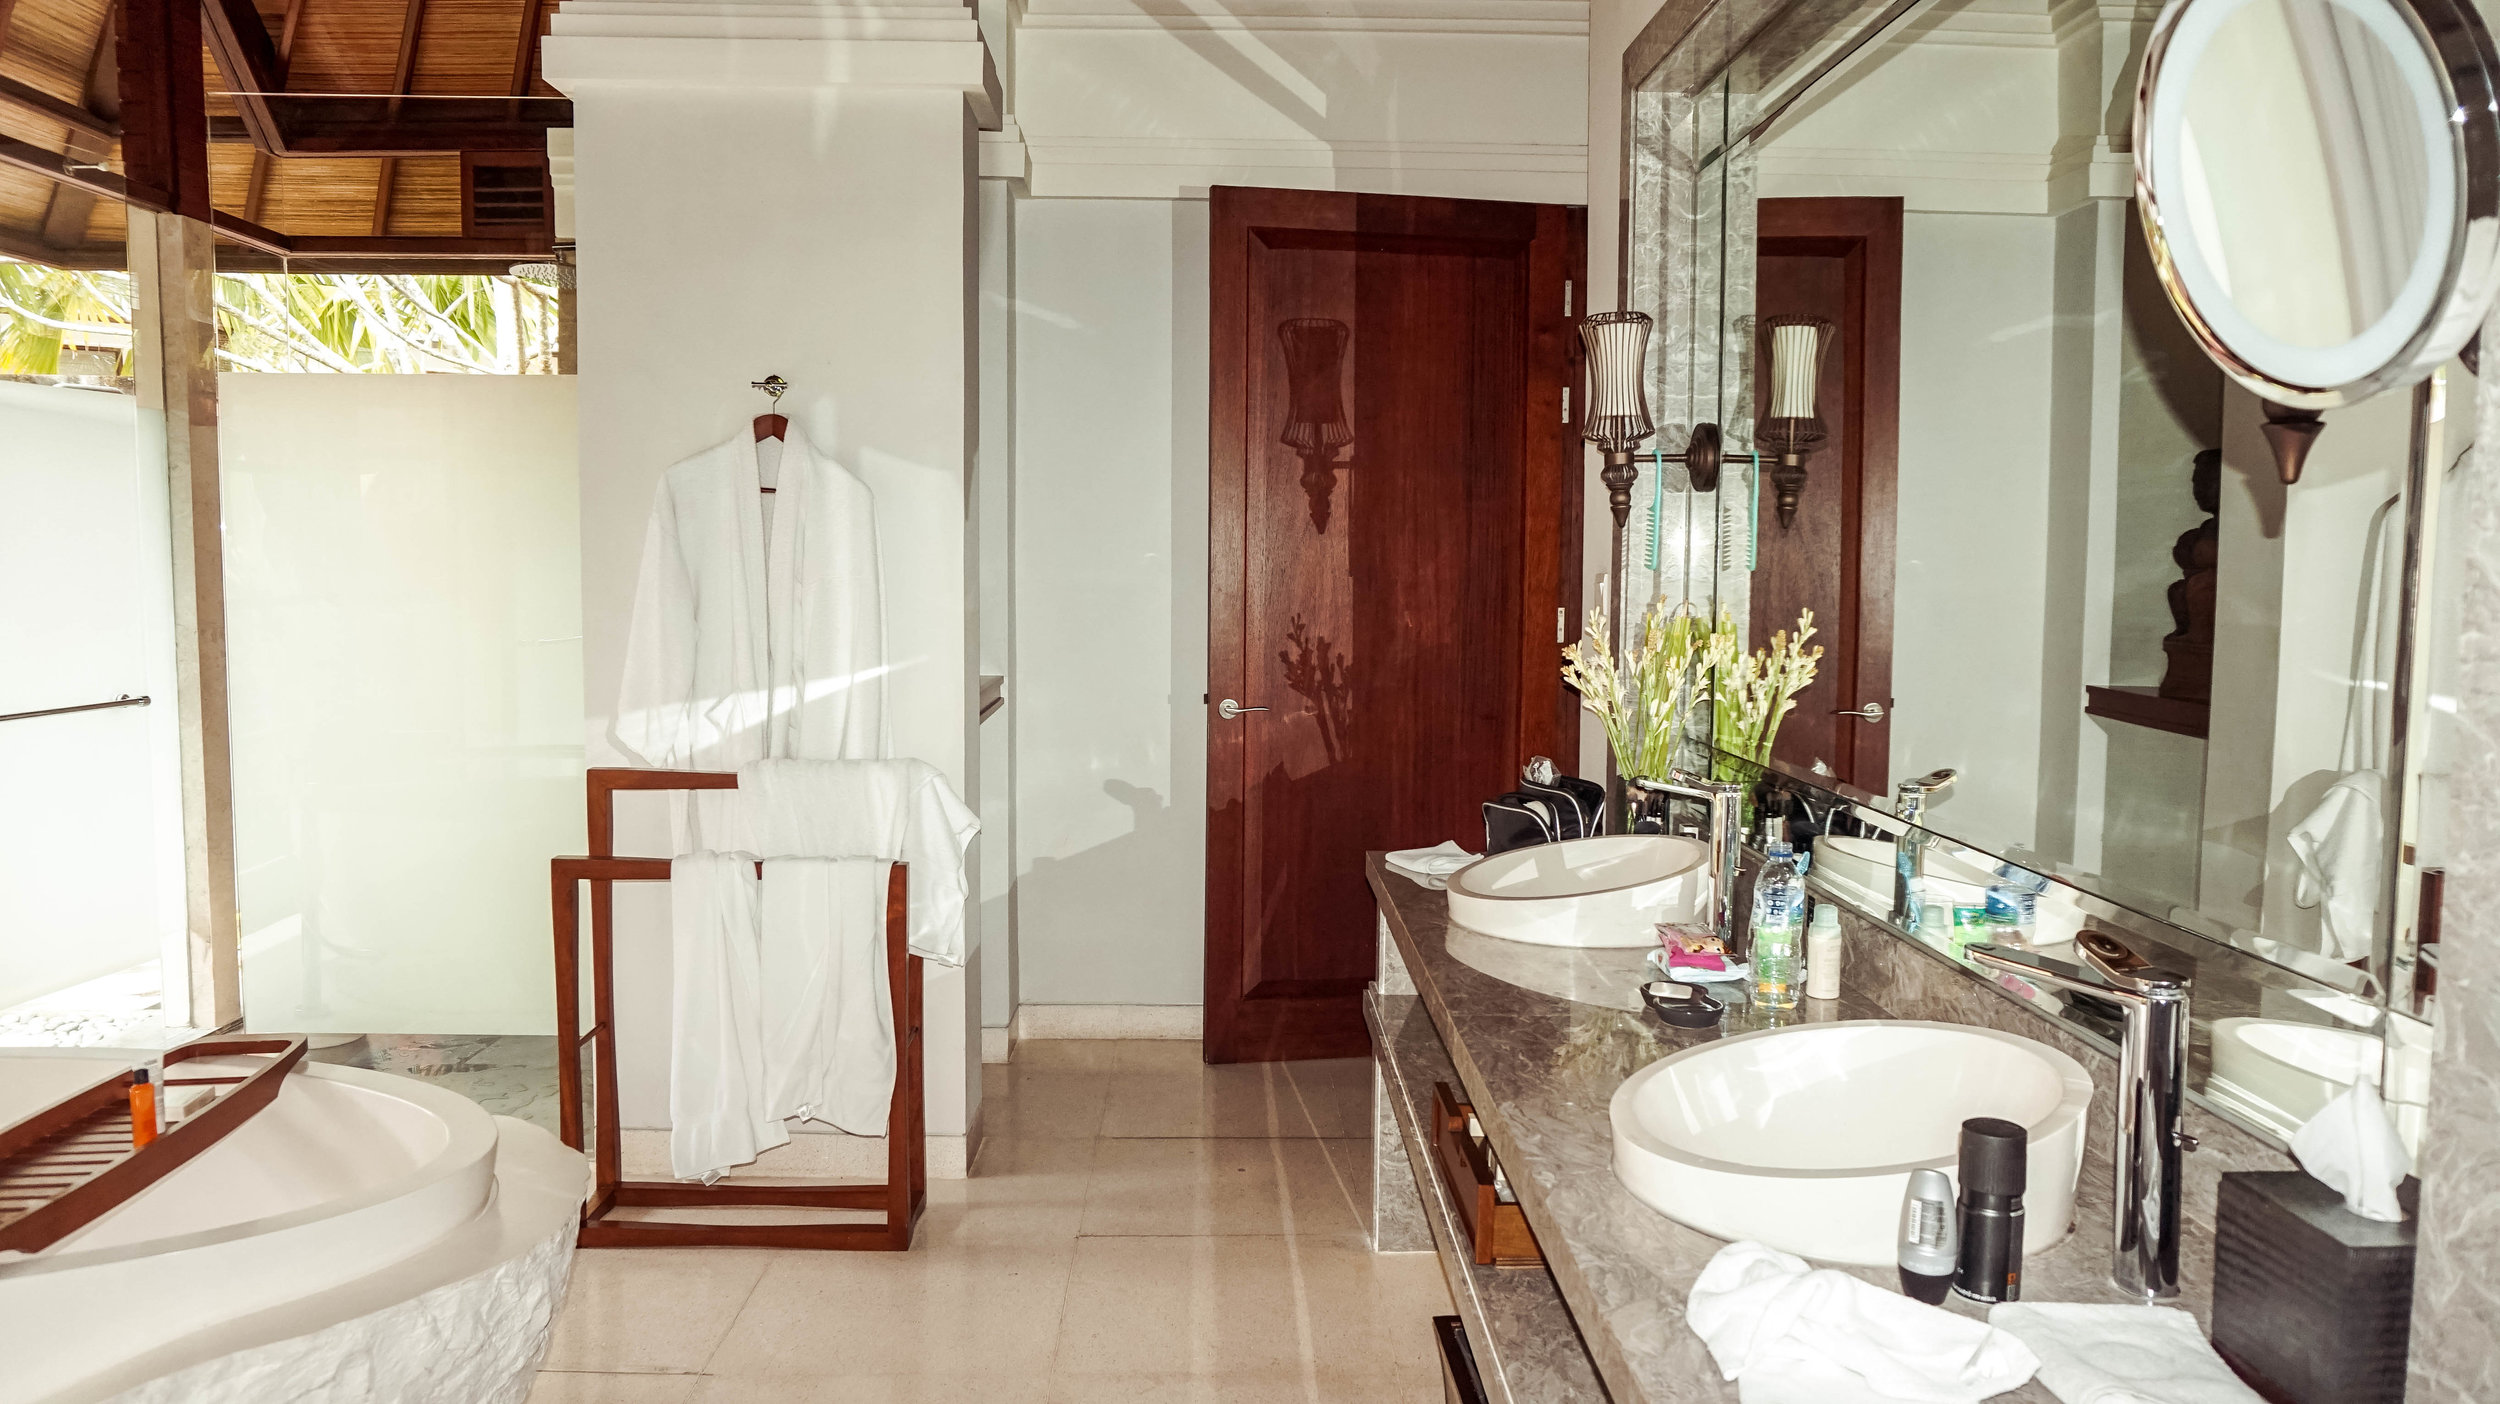 Hilton-bali-resort-1bedroom-bathroom-2018.jpg